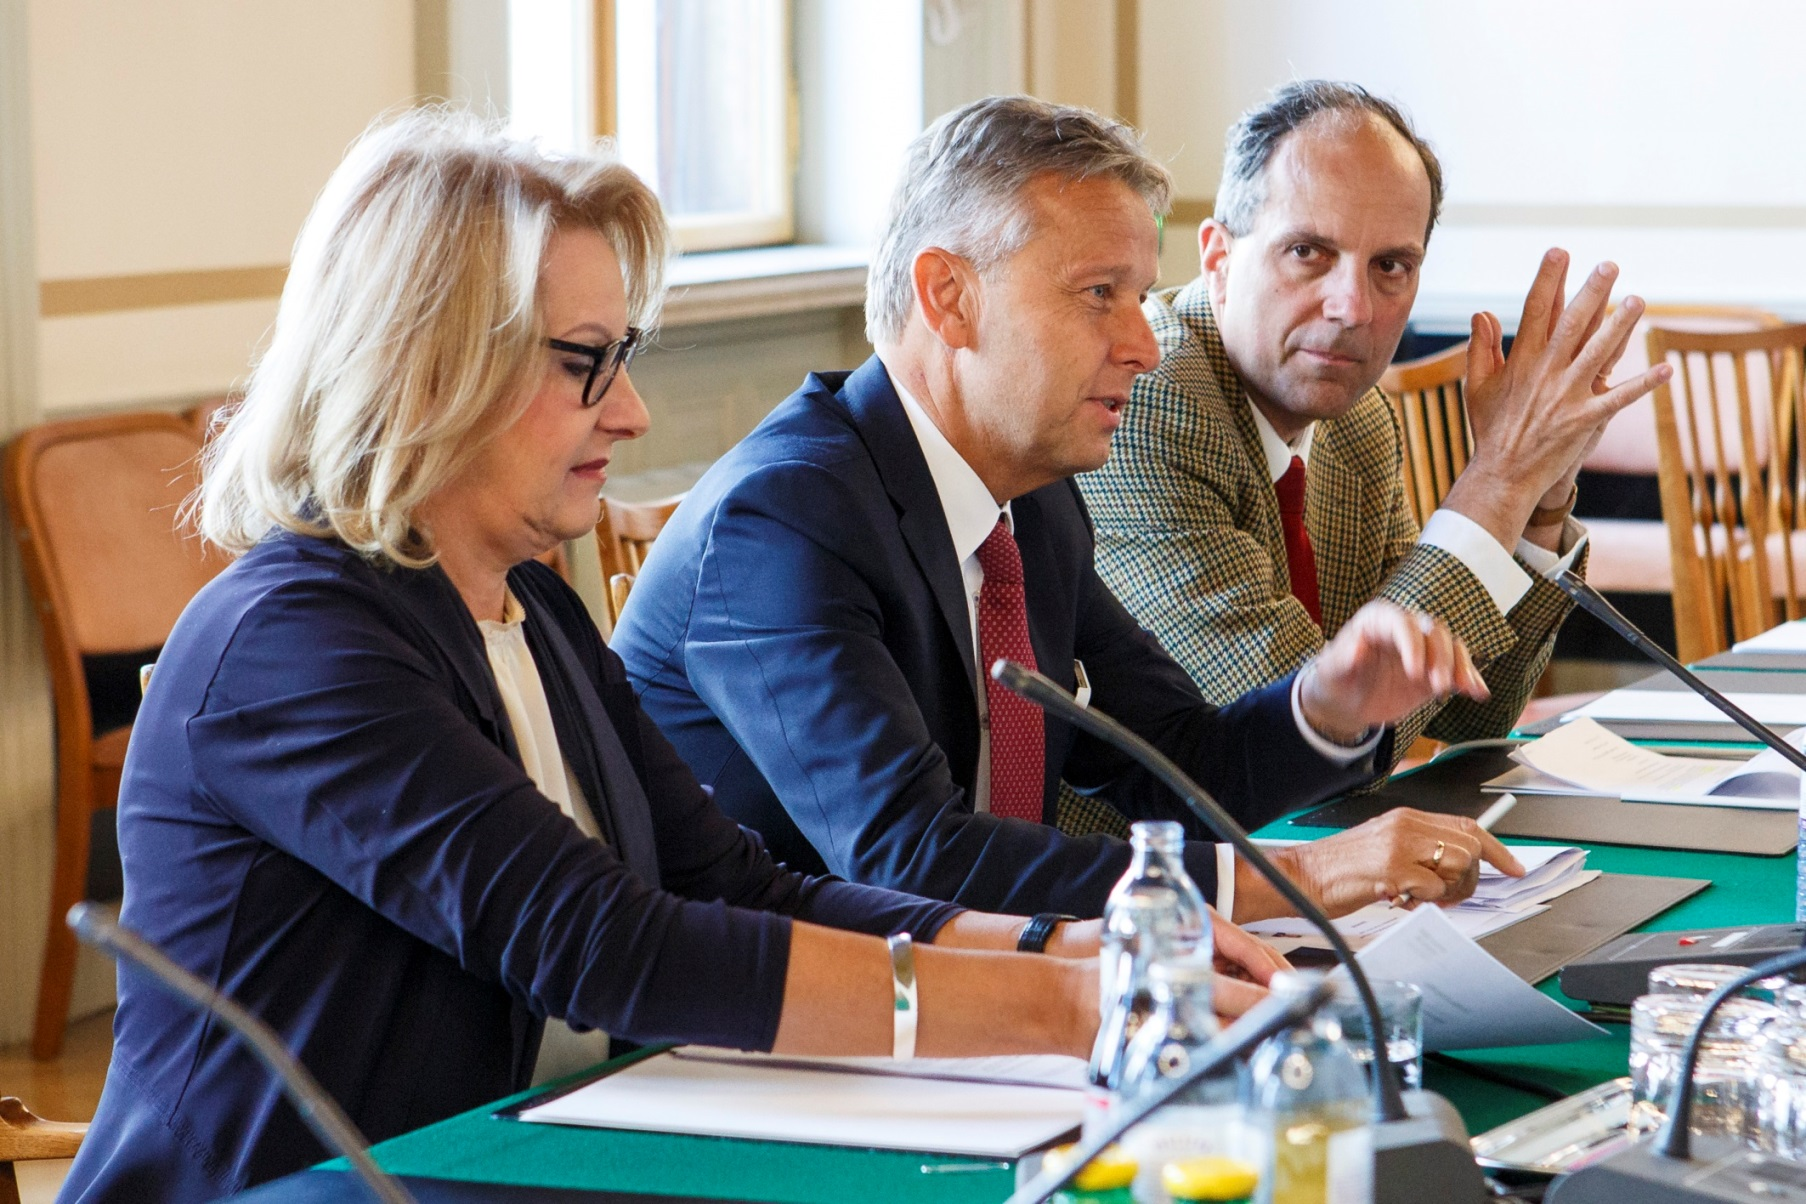 (c) Parlamentsdirektion / Bildagentur Zolles KG / Christian Hofer